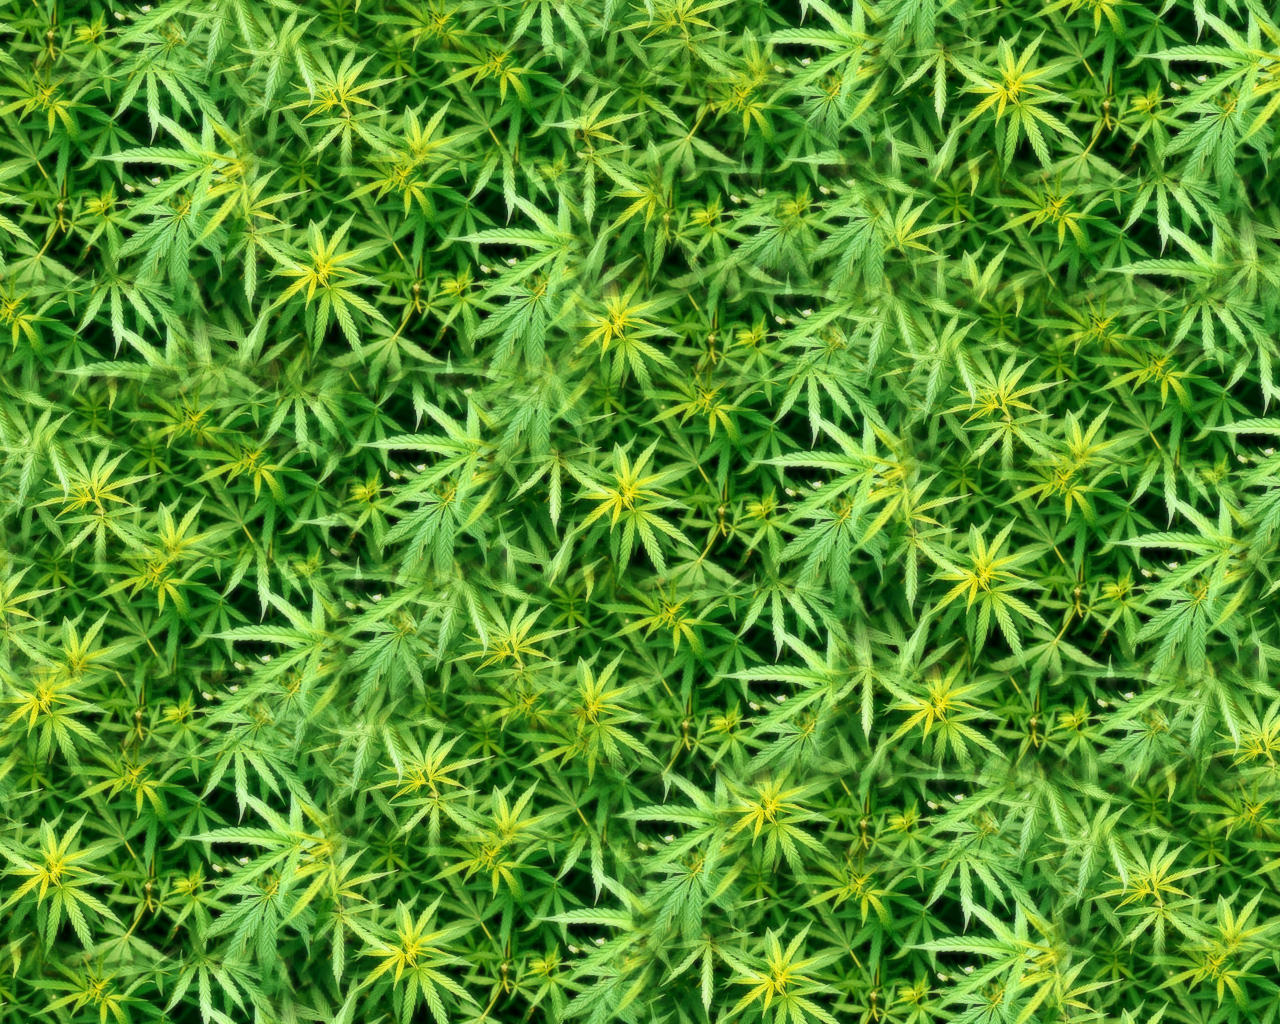 Dank wallpaper by club marijuana on deviantart - Dank wallpaper ...